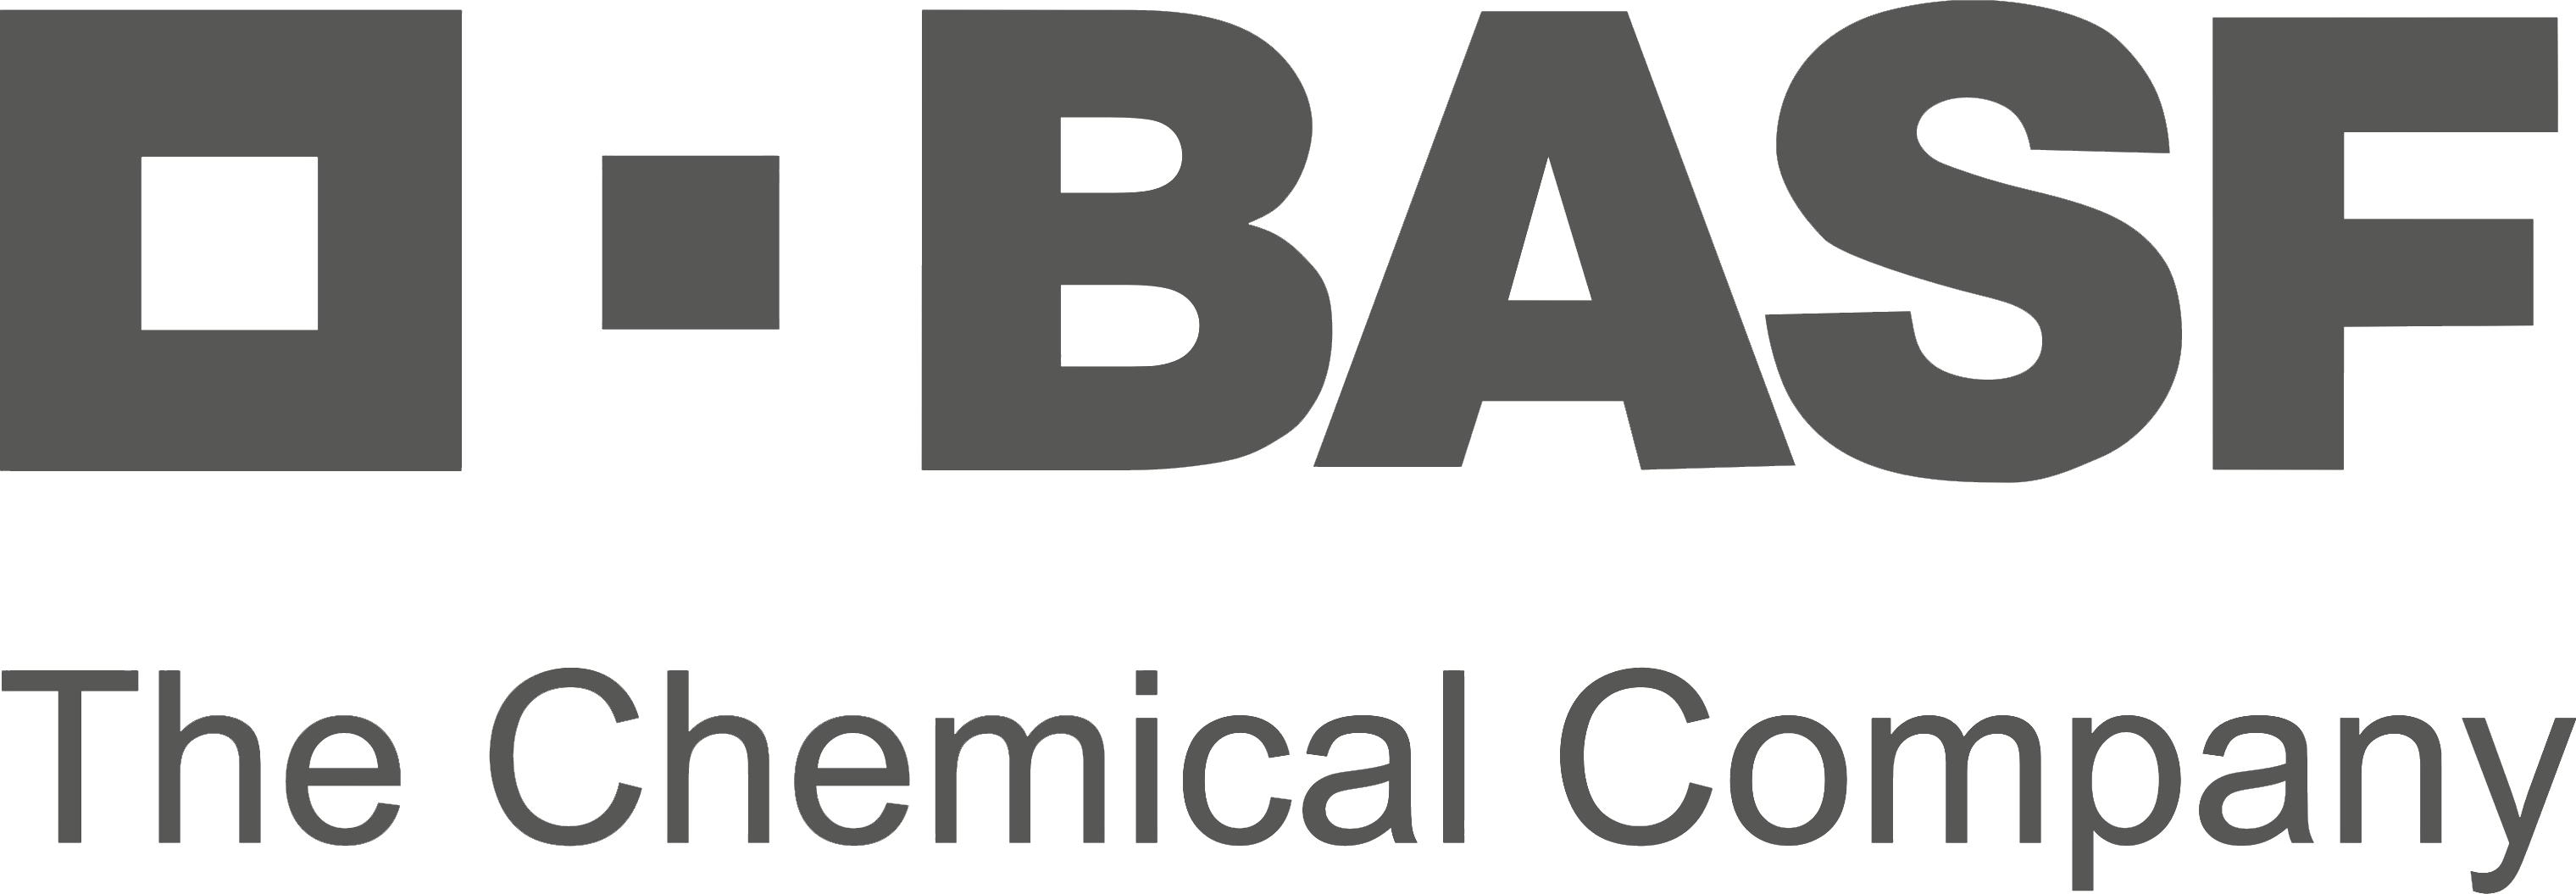 BASF-logo-grey